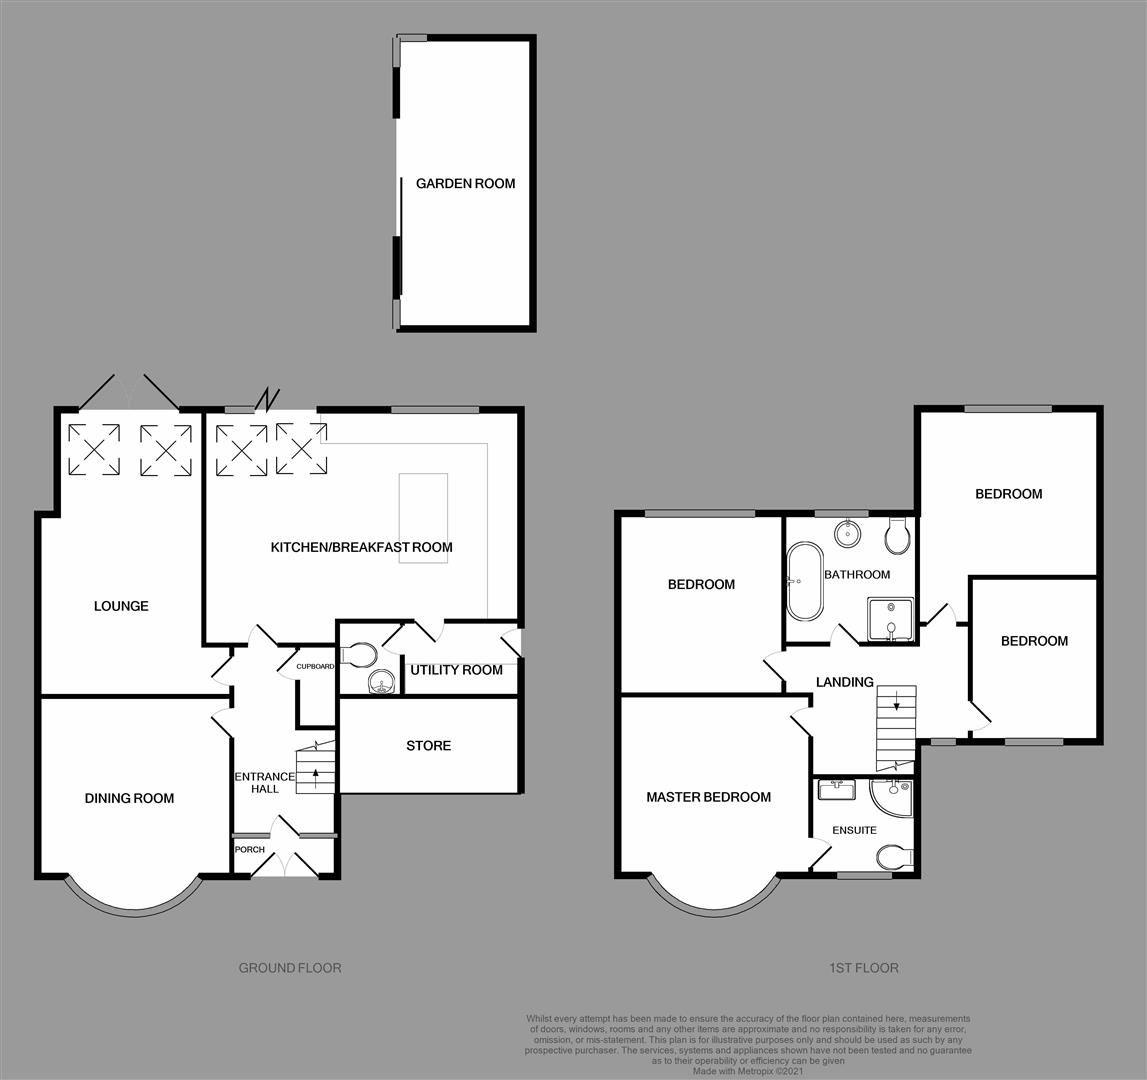 4 bed semi-detached for sale - Property Floorplan